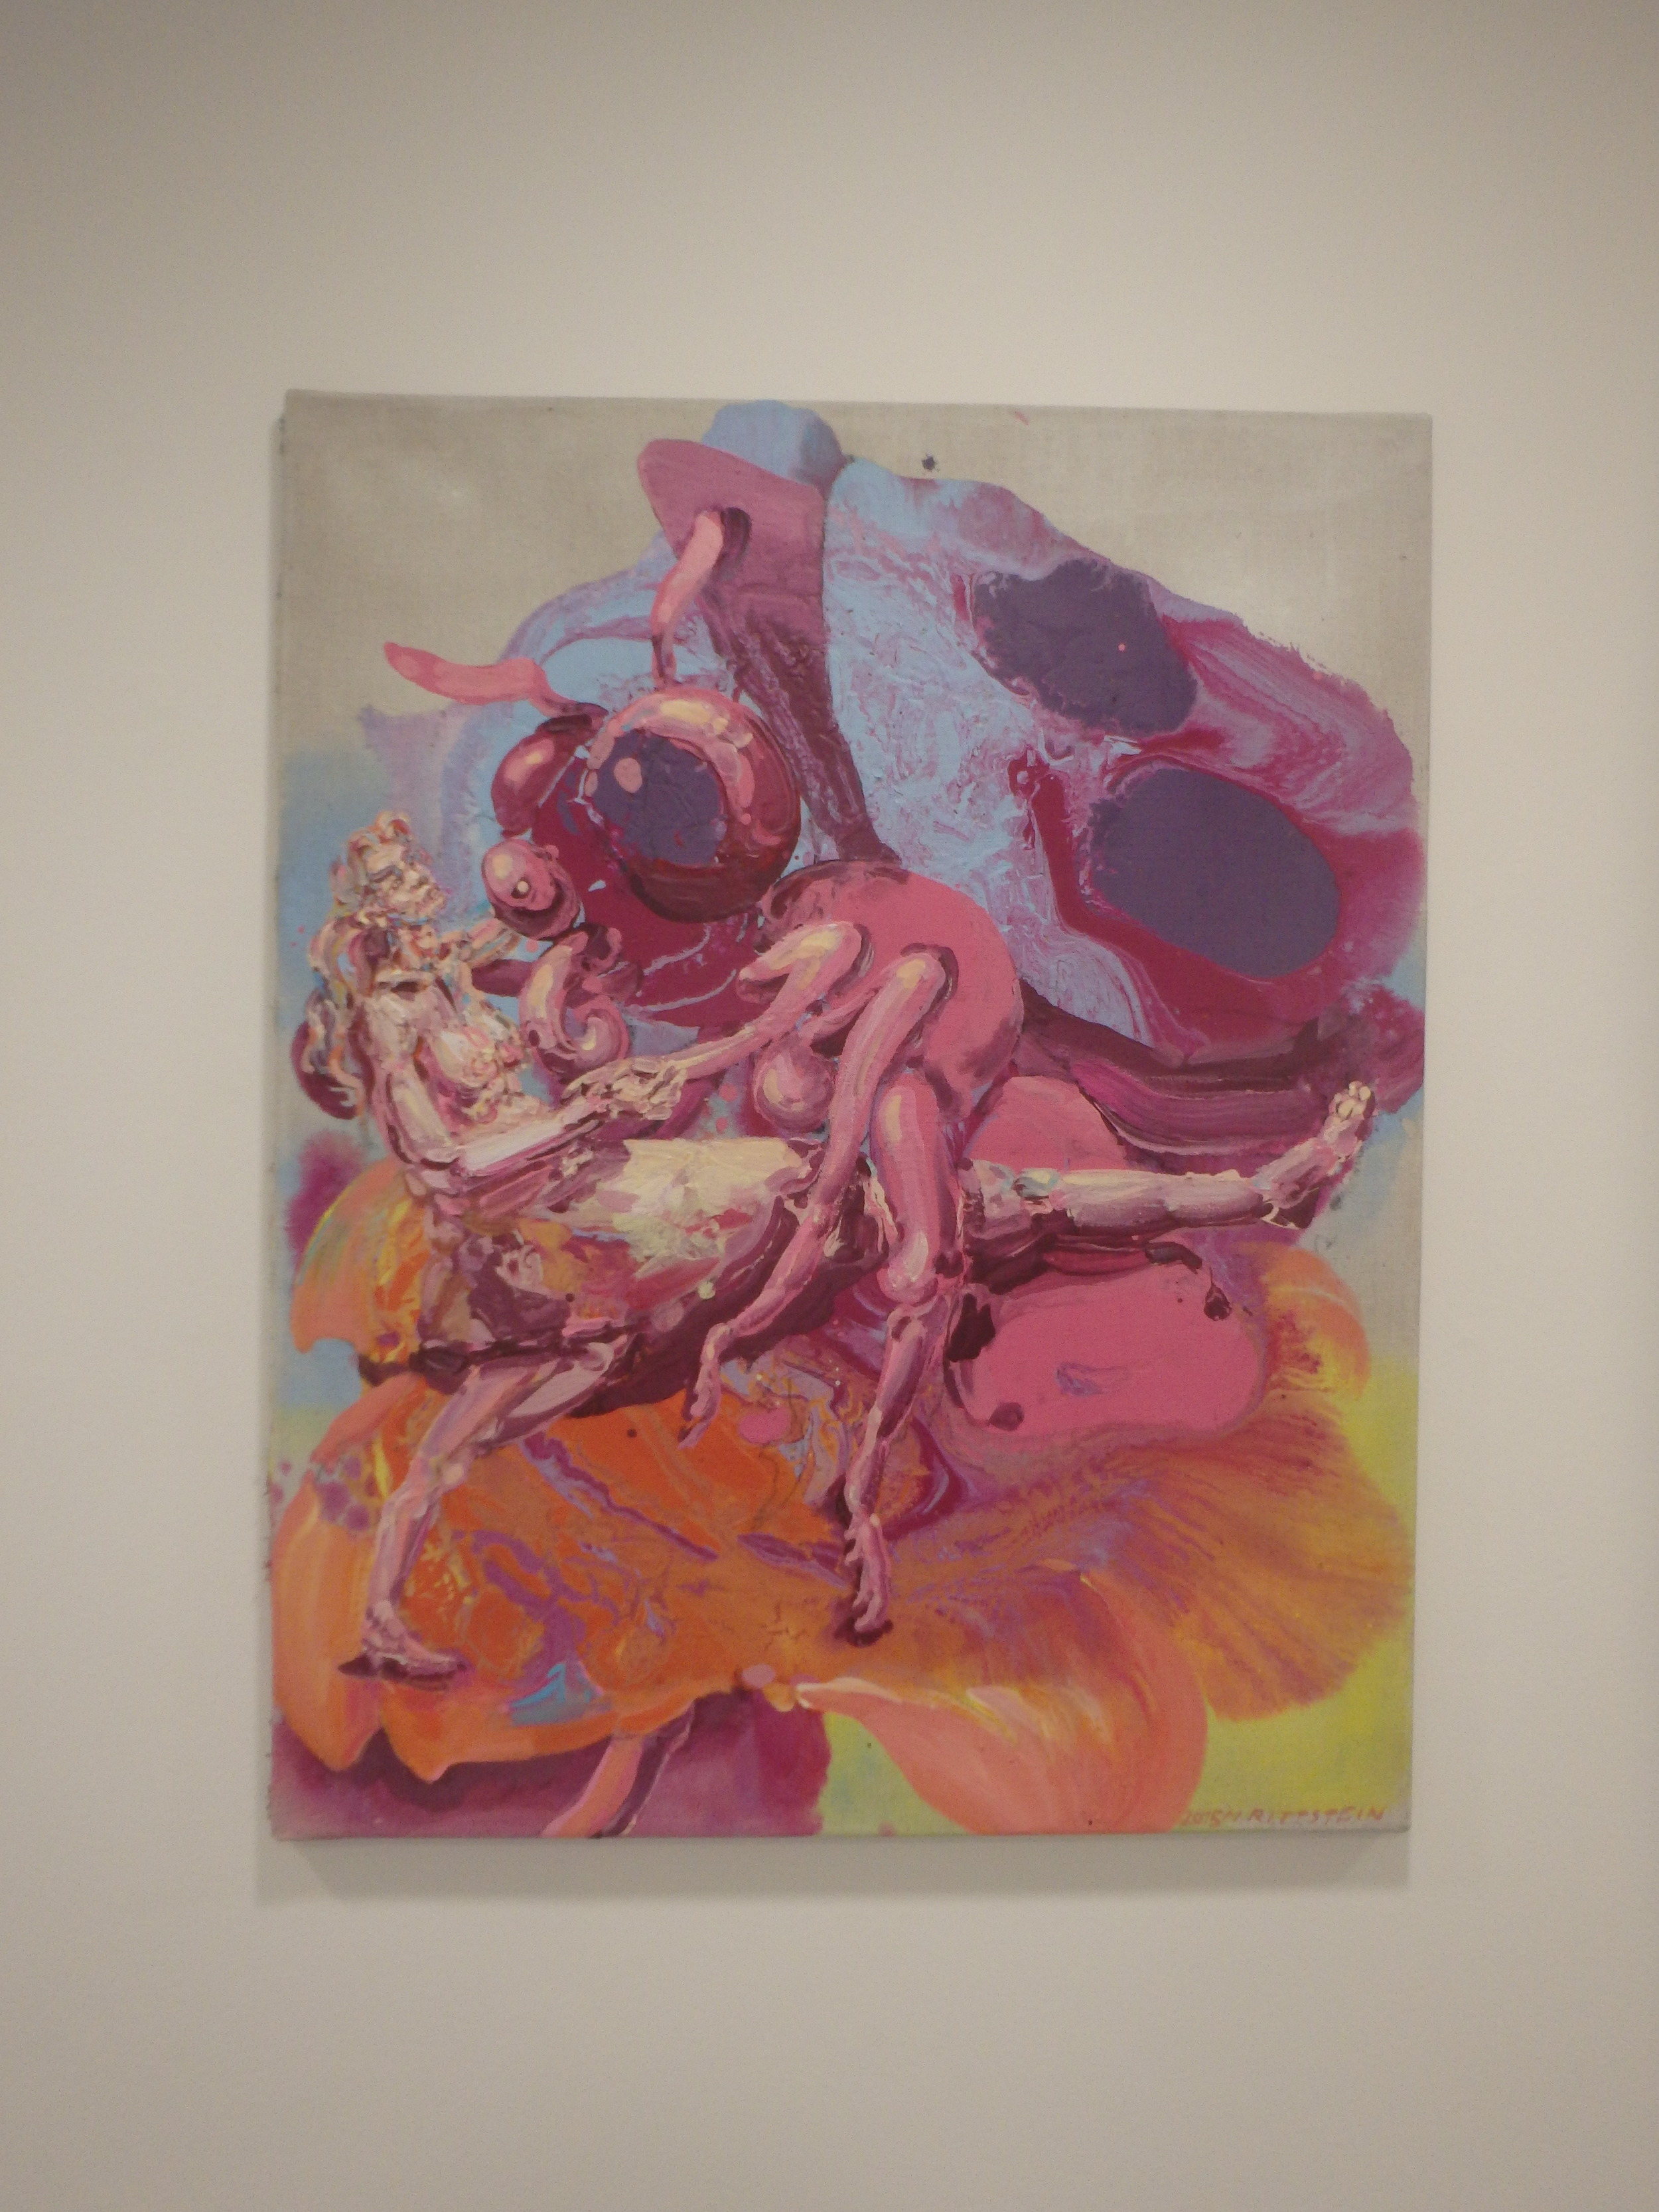 Michael Rittstein, Okvětní tanec, 2015, plátno, akryl, 80 x 100 cm